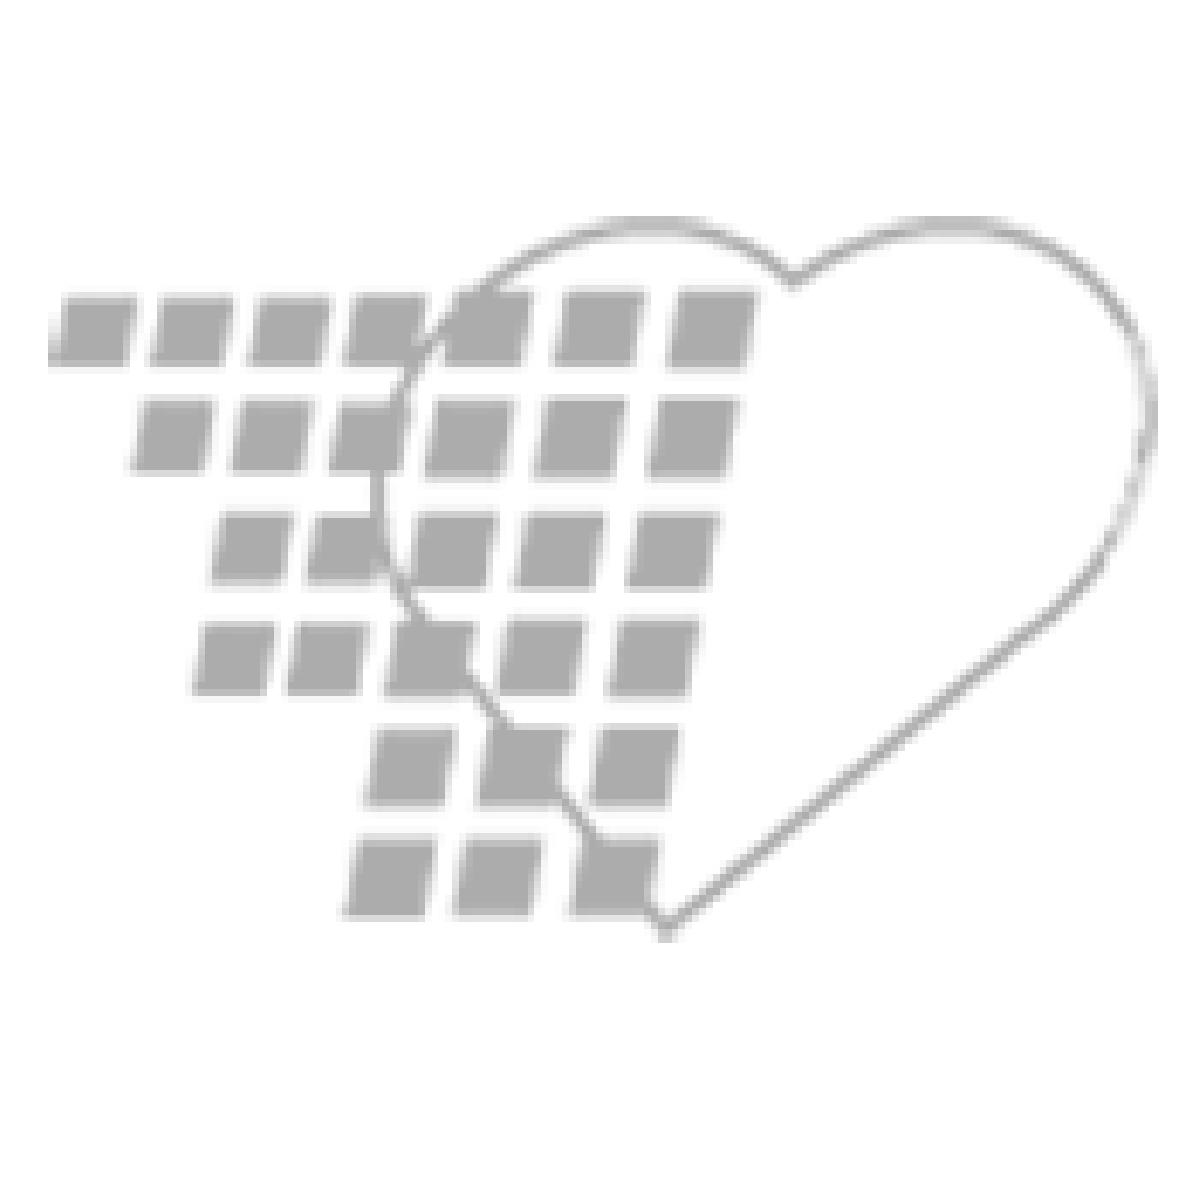 02-38-7099 Bayer Contour® Blood Glucose Test Strips